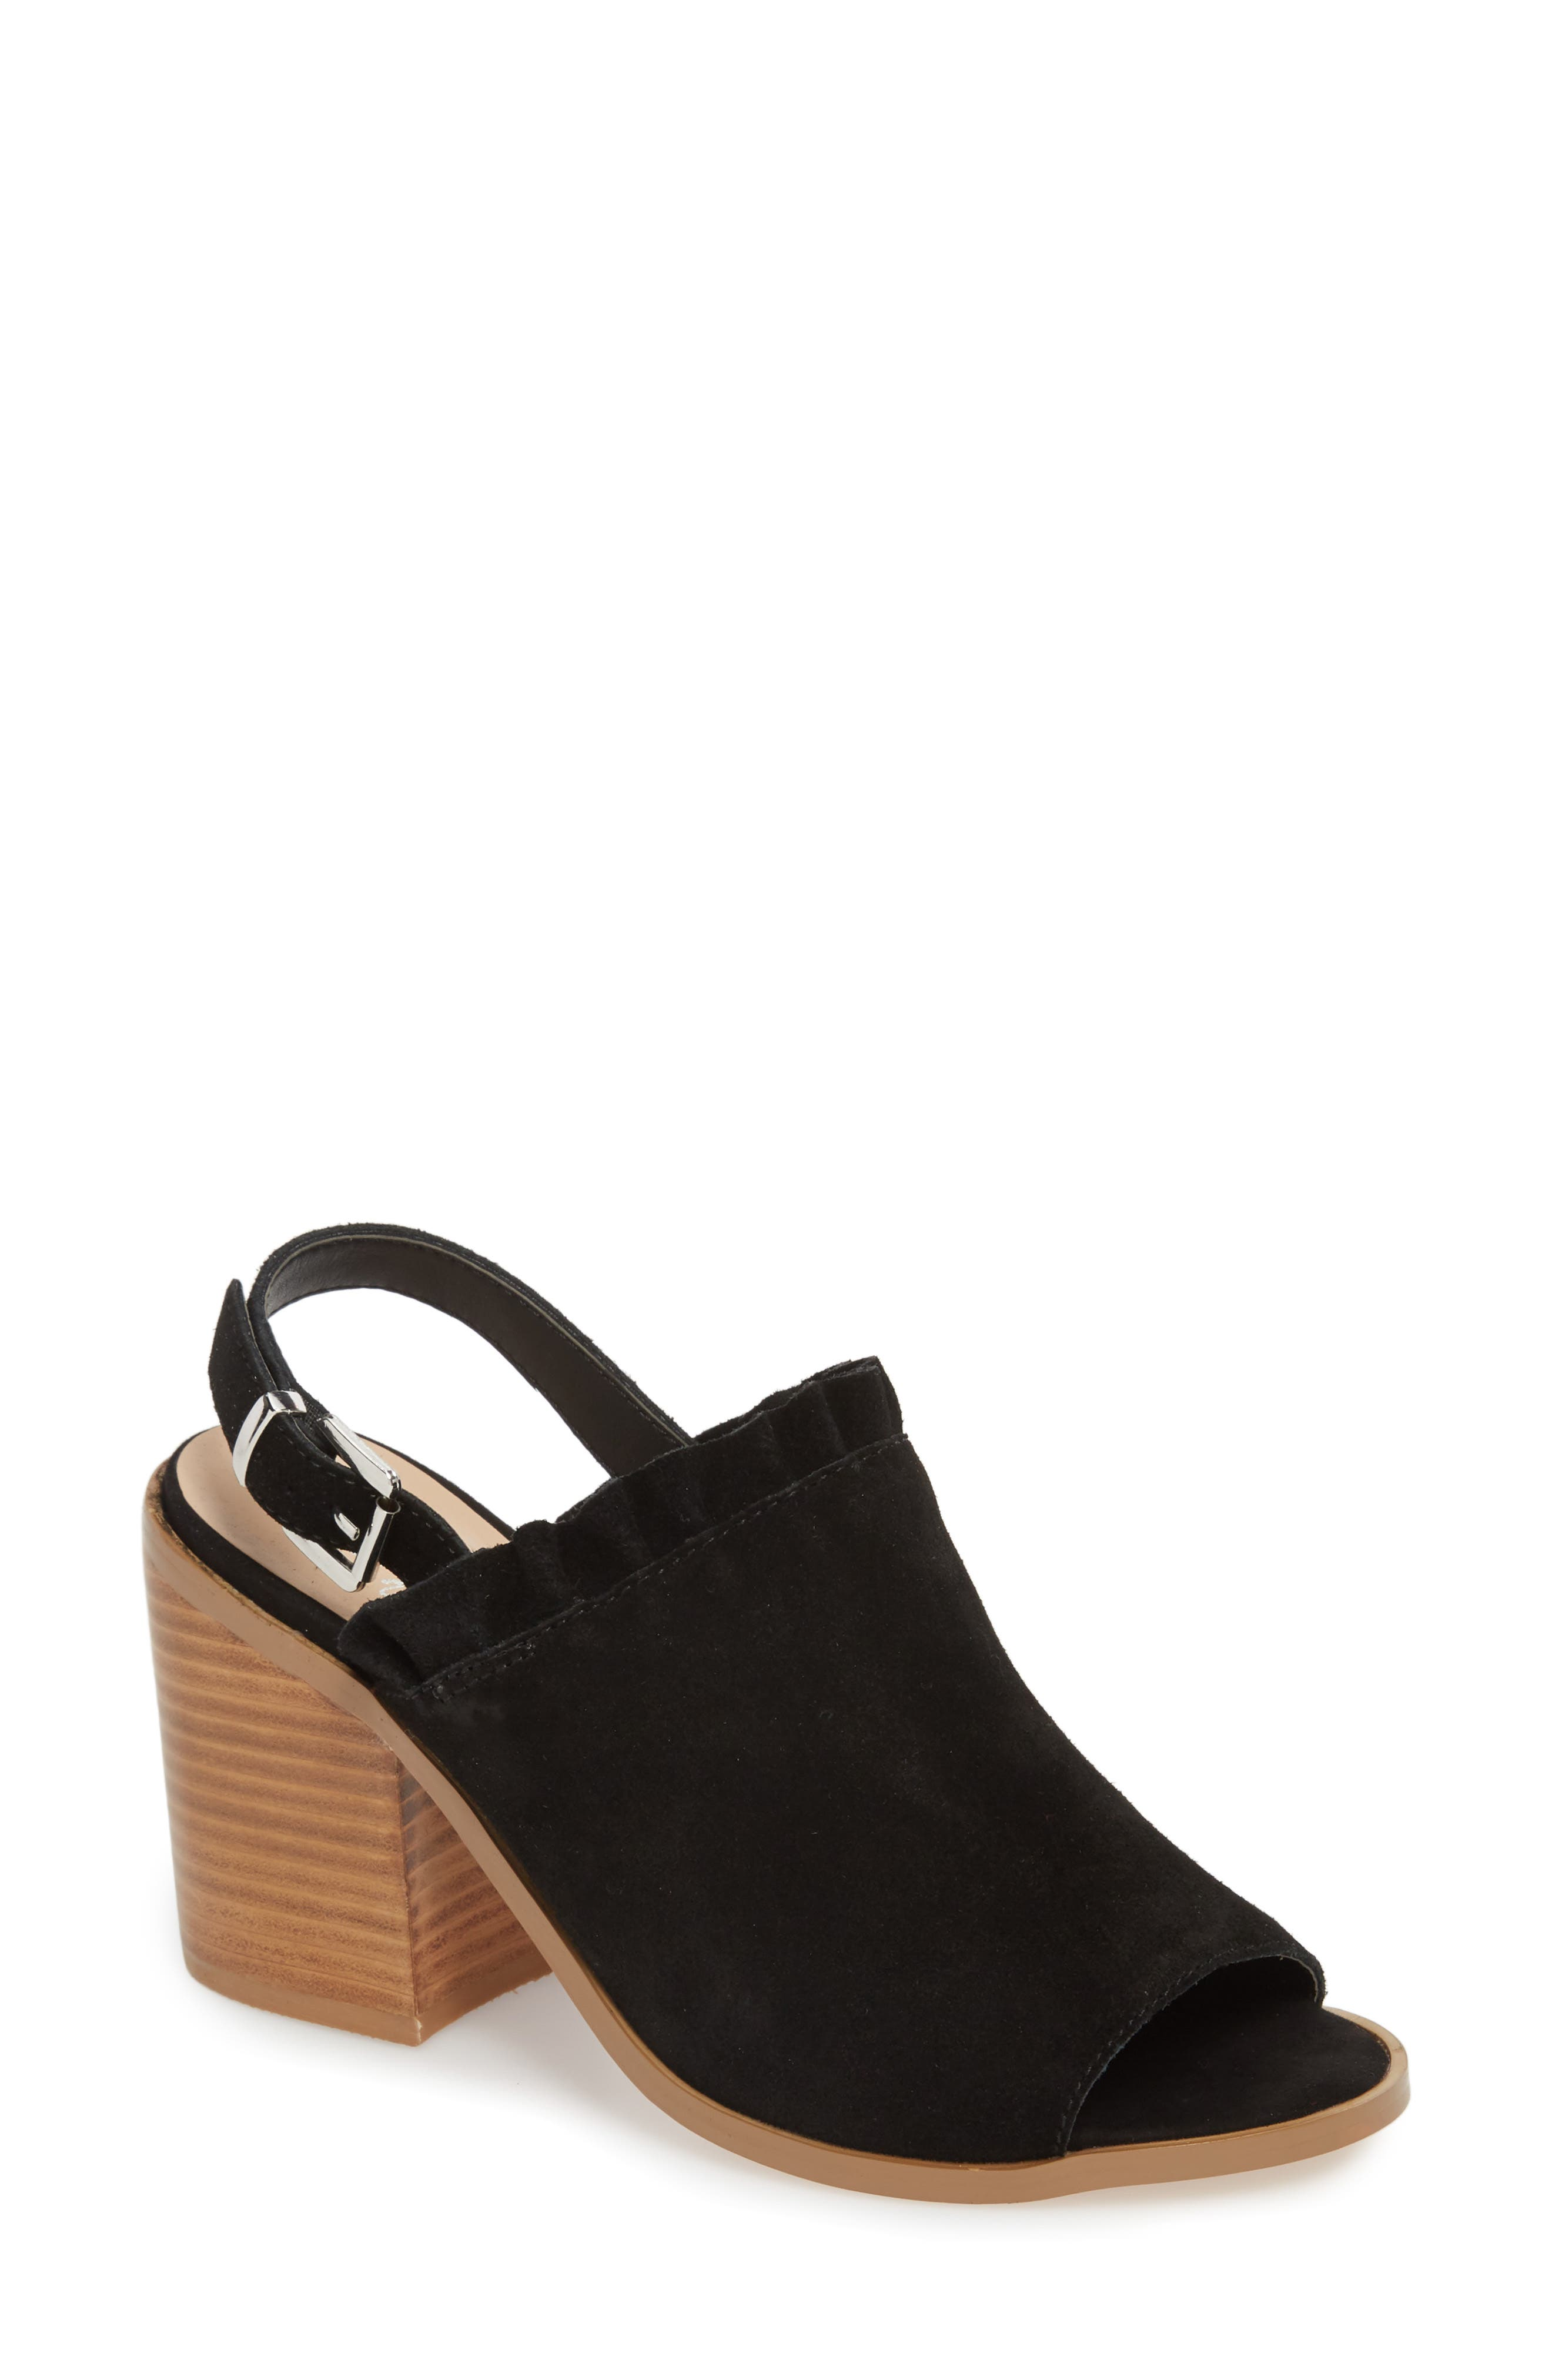 Sbicca Carla Block Heel Sandal, Black